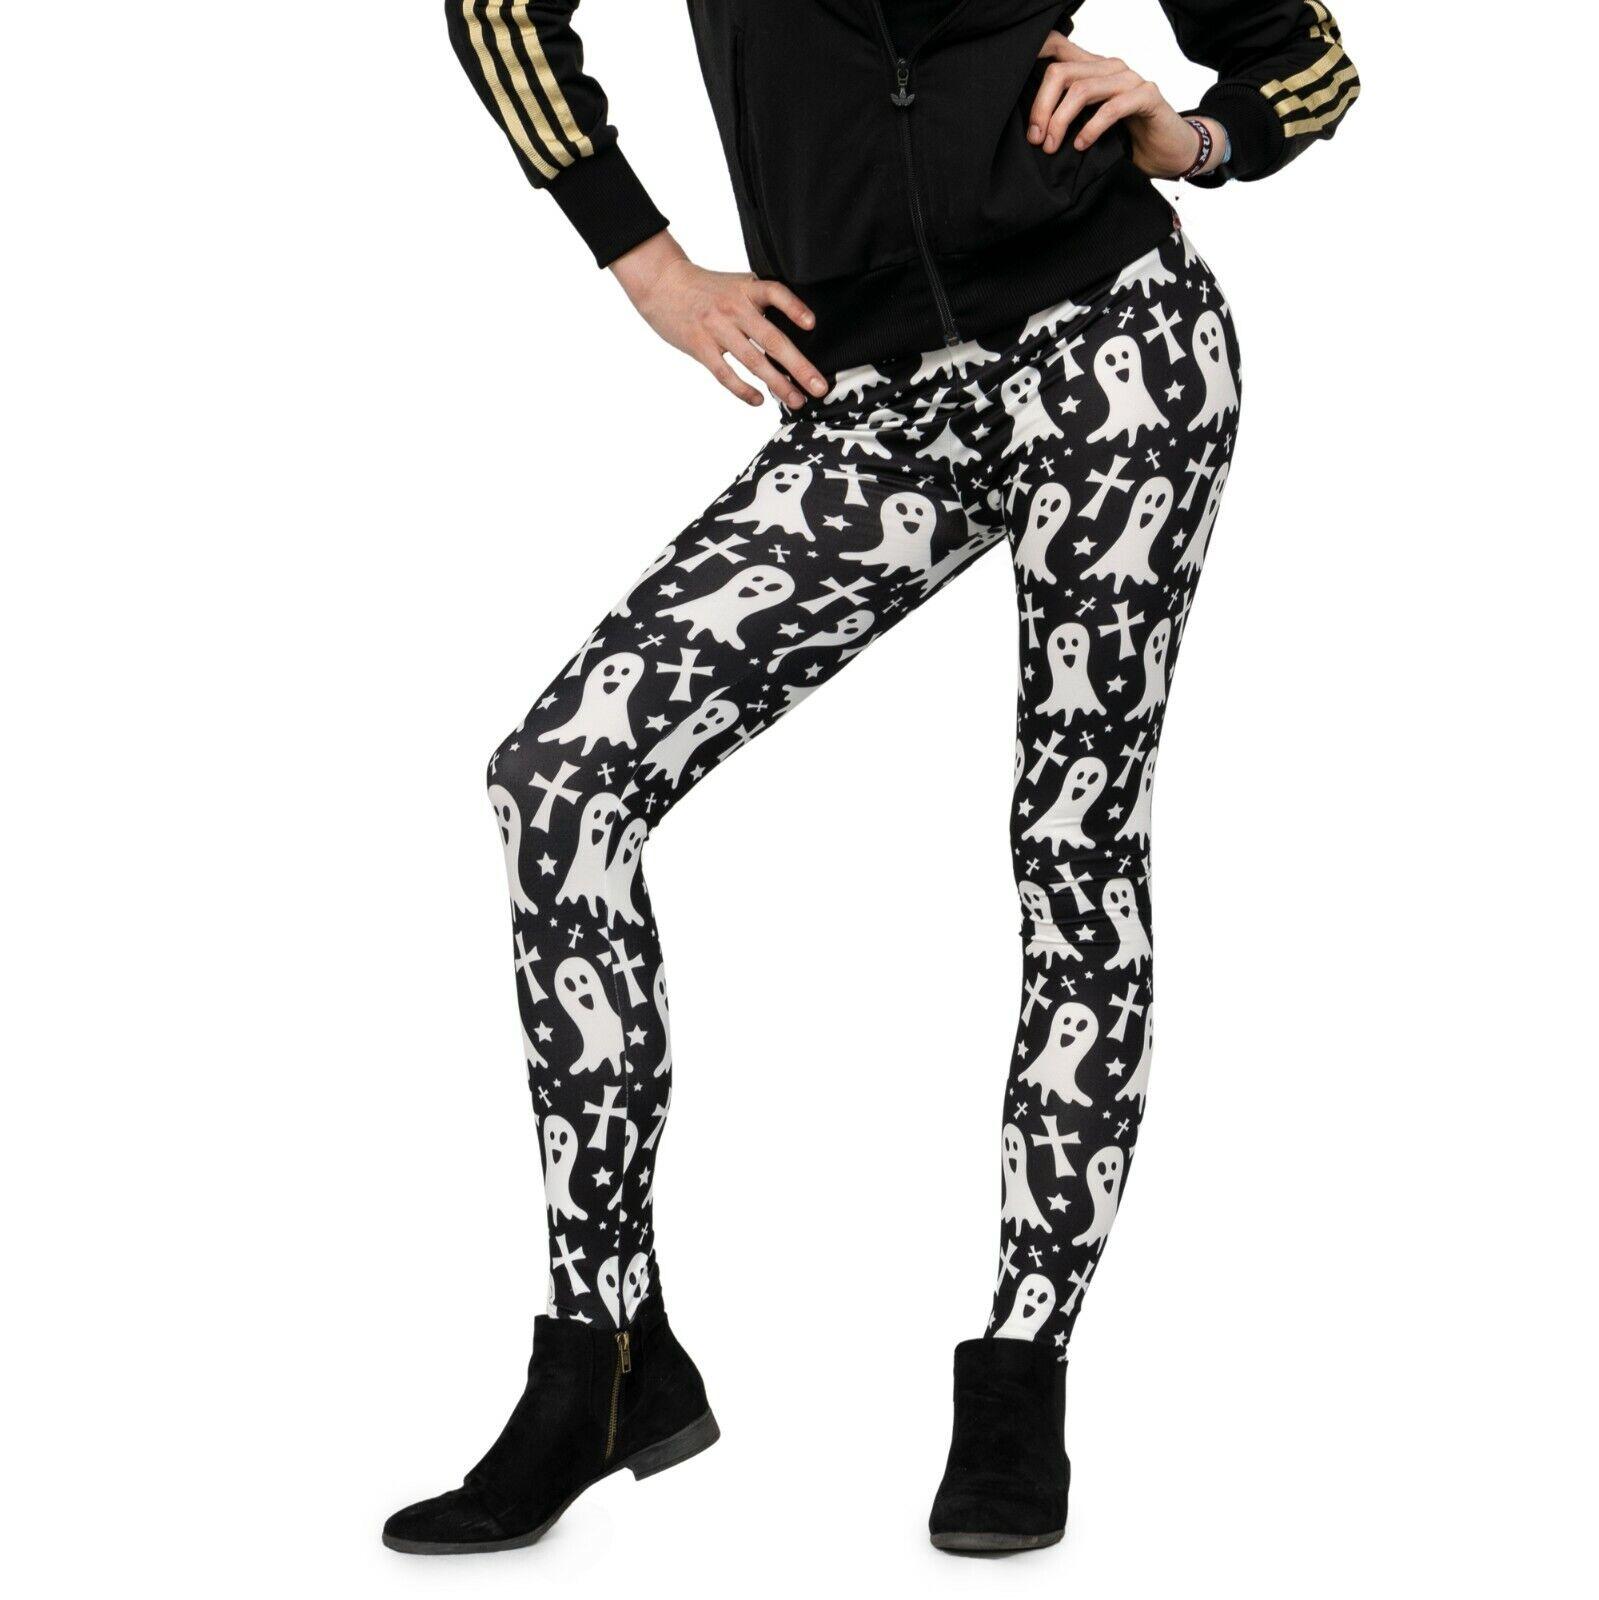 Pealu GHOST bunte bedruckte Leggings Einheitsgröße Damen Hose bequem Halloween